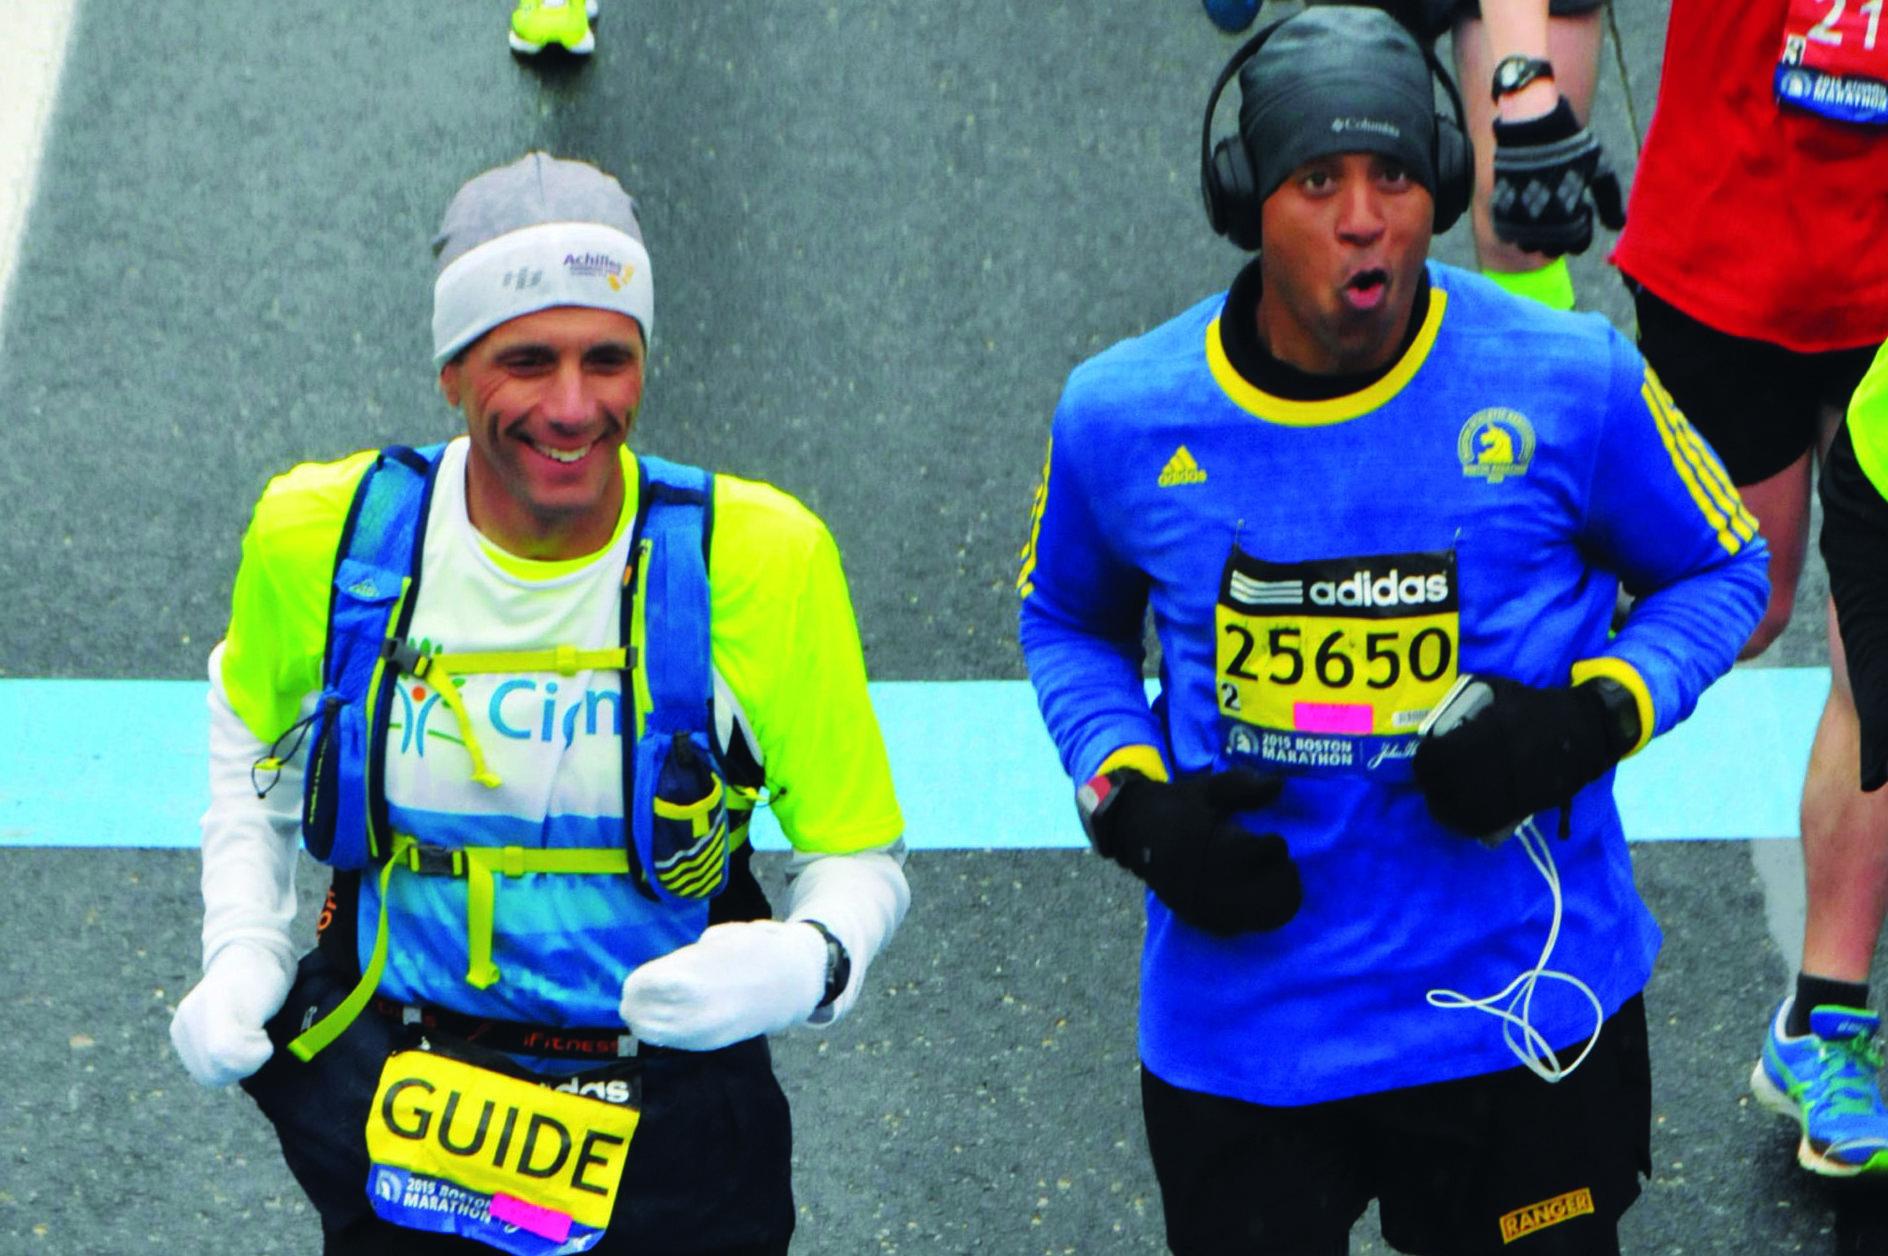 Cedric King, at right, and David Cordani at the 2015 Boston Marathon. (Courtesy Cedric King)